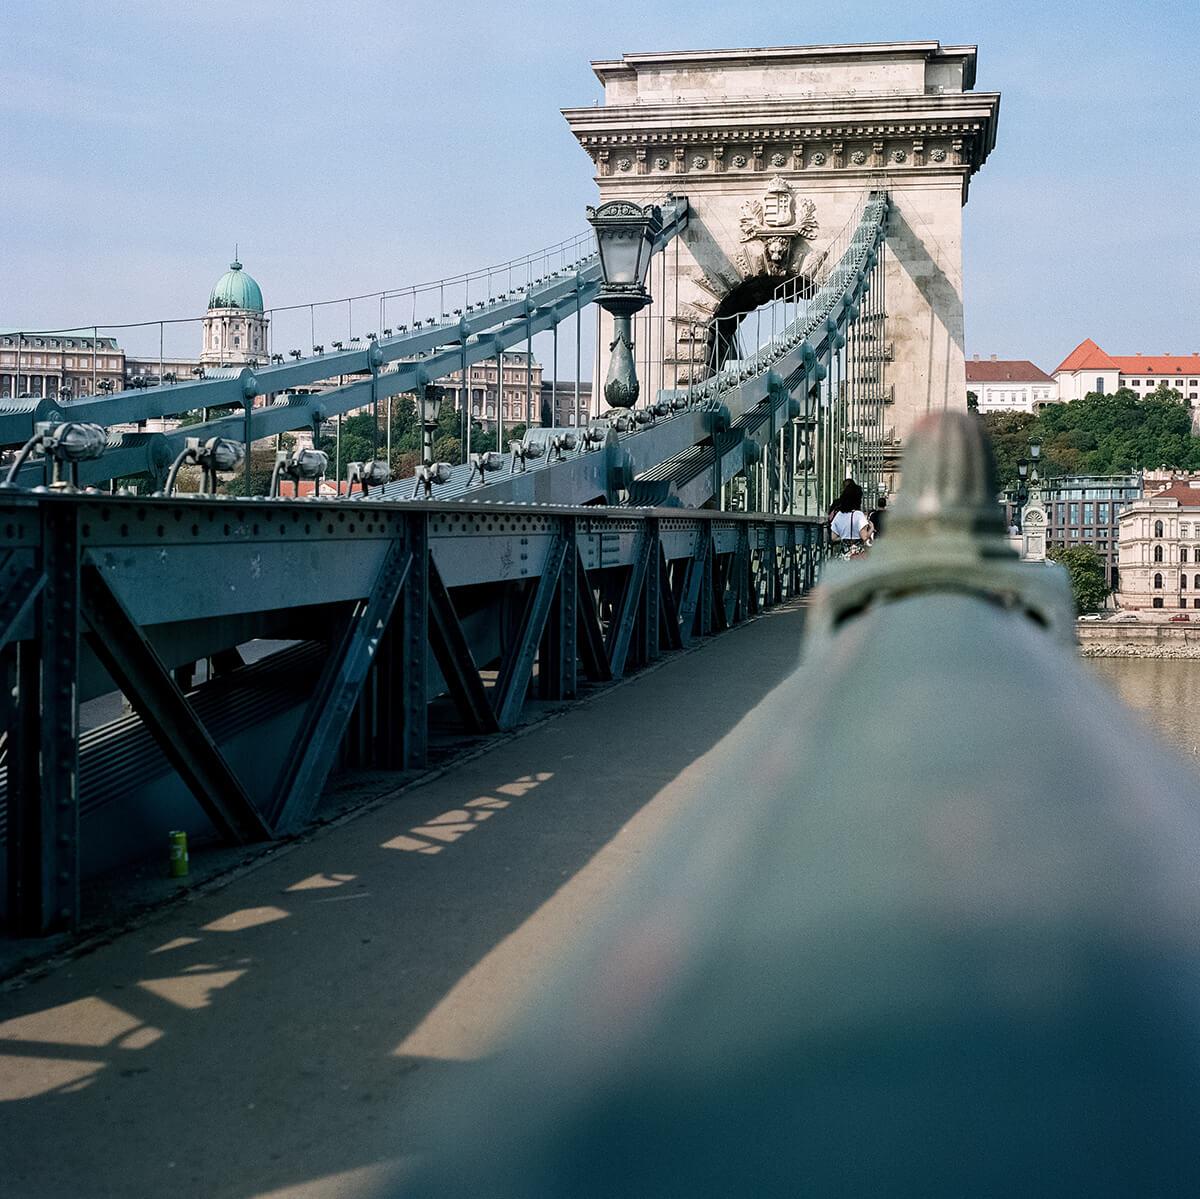 Kettenbrücke Chain Bridge Budapest (c) Lomoherz